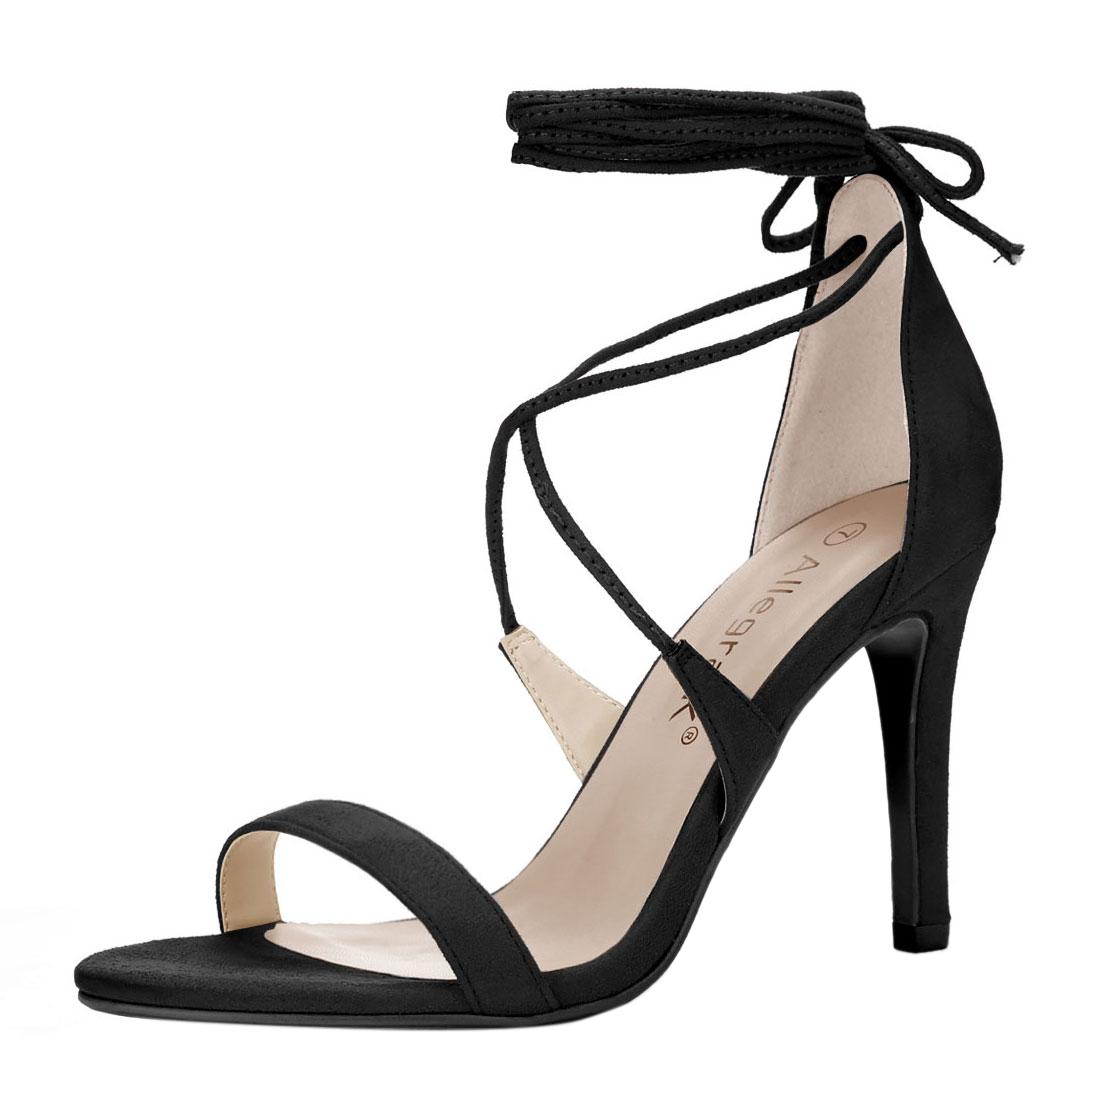 Women Open Toe Stiletto High Heel Lace-Up Sandals Black US 6